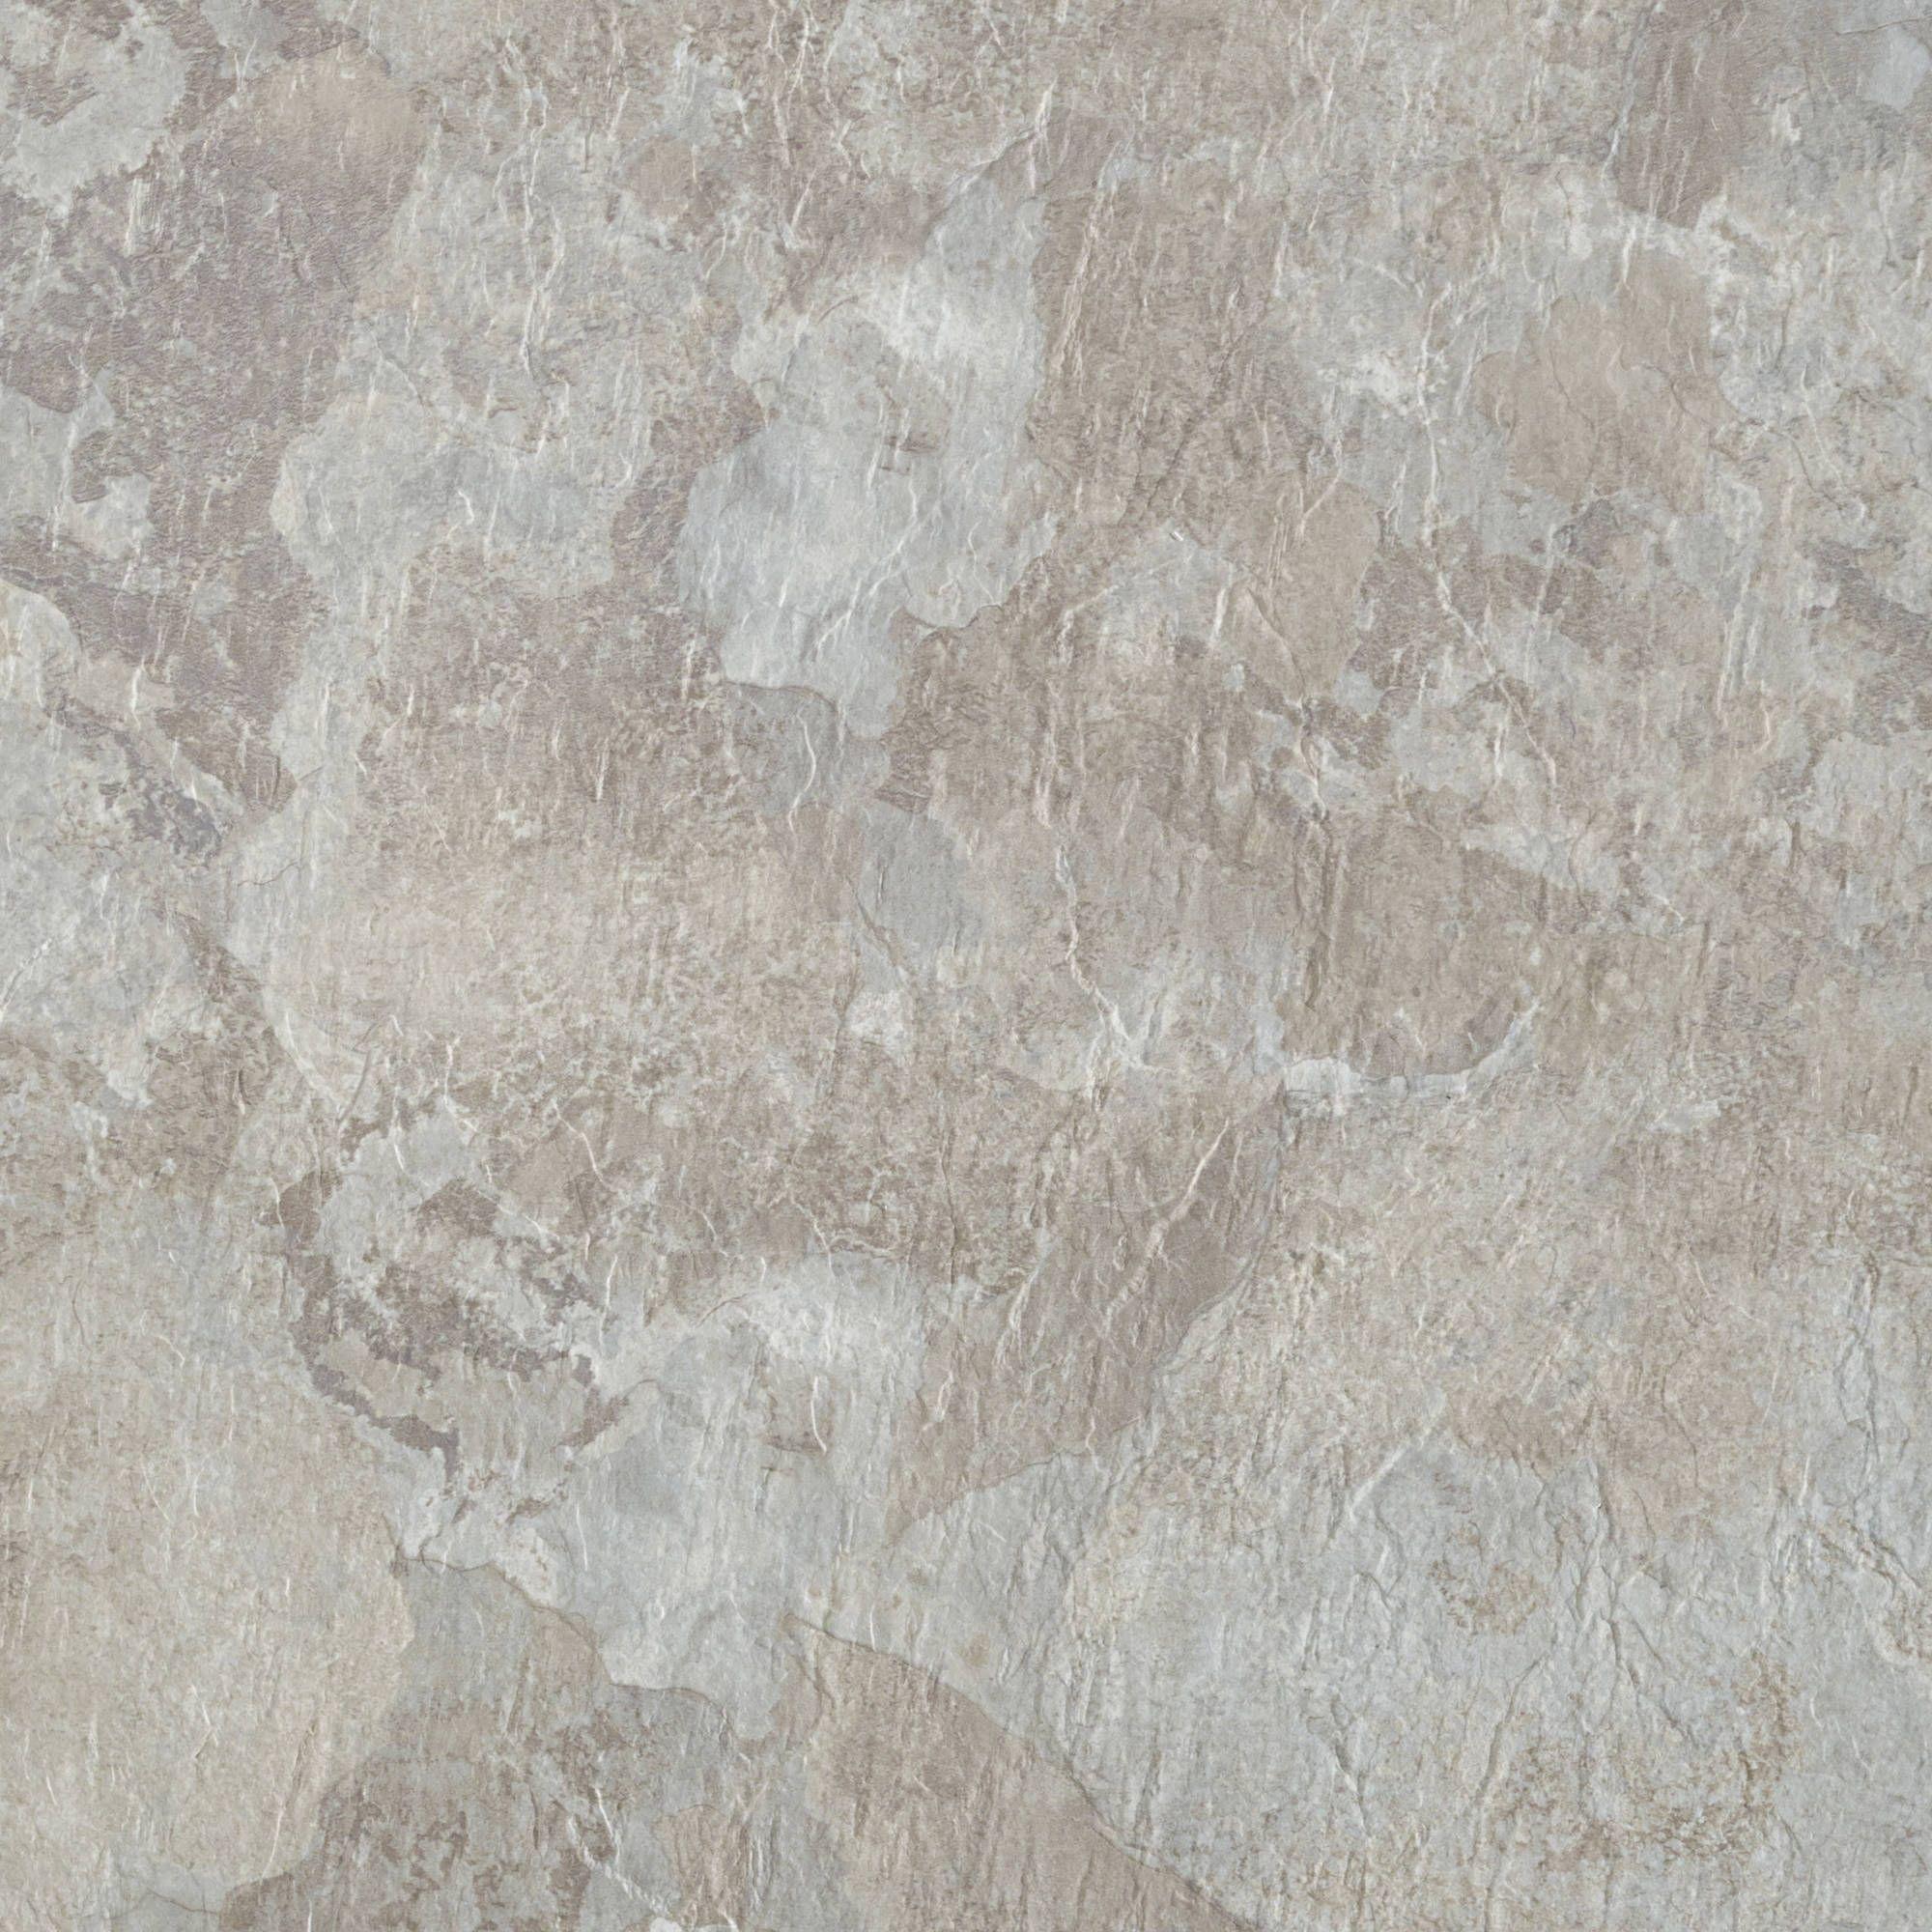 18 X 18 Stone Floor Tile Httpnextsoft21 Pinterest Stone